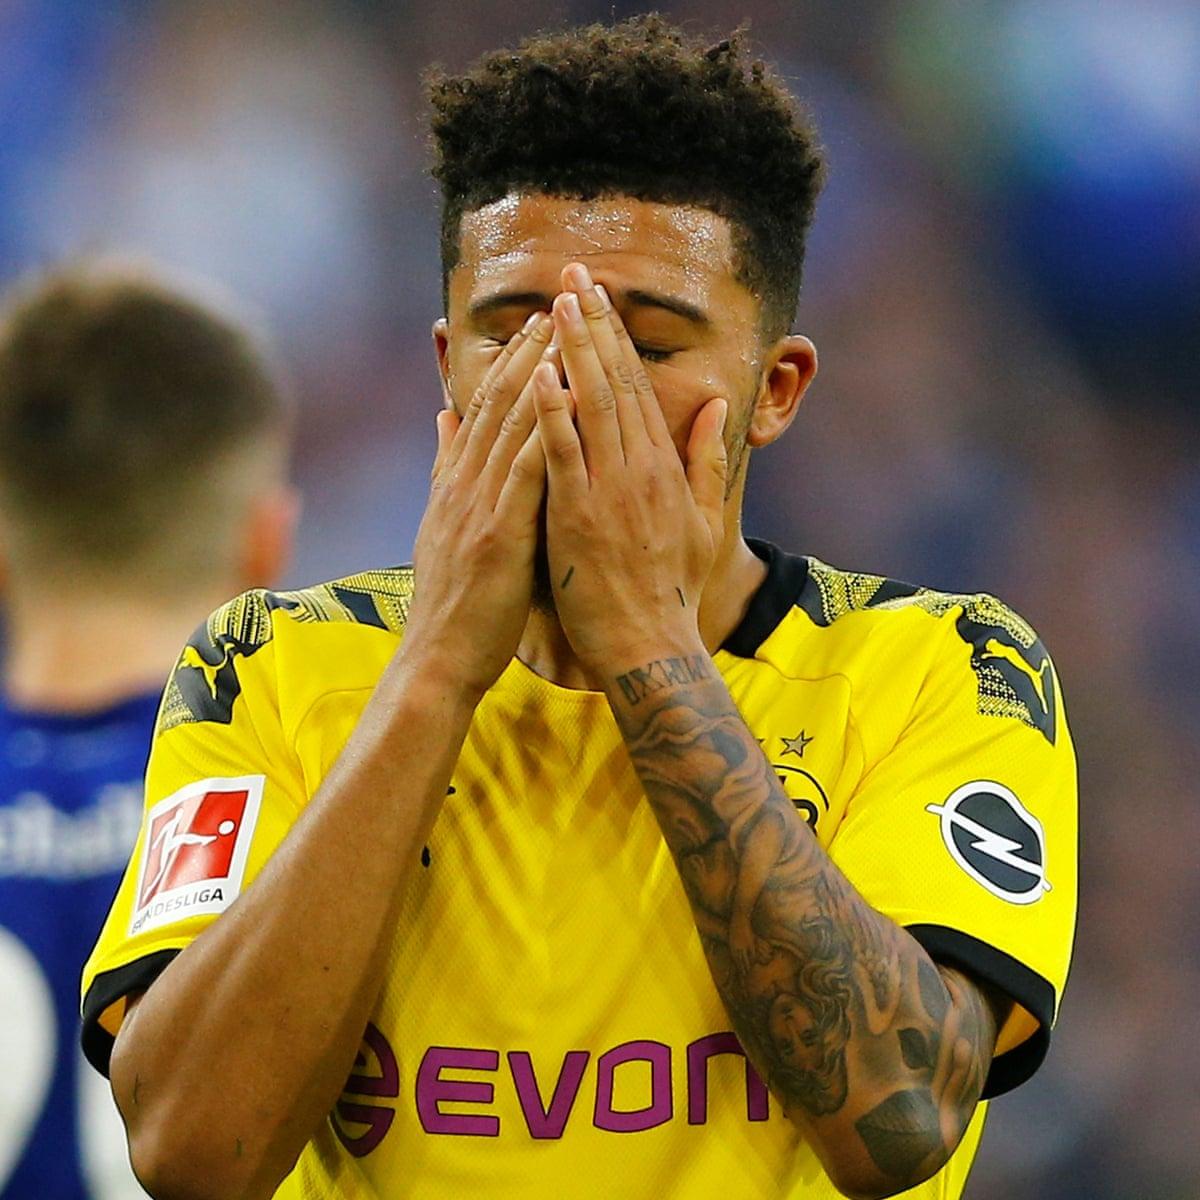 Dortmund And Schalke Both Have Cause For Revierderby Regrets Bundesliga The Guardian